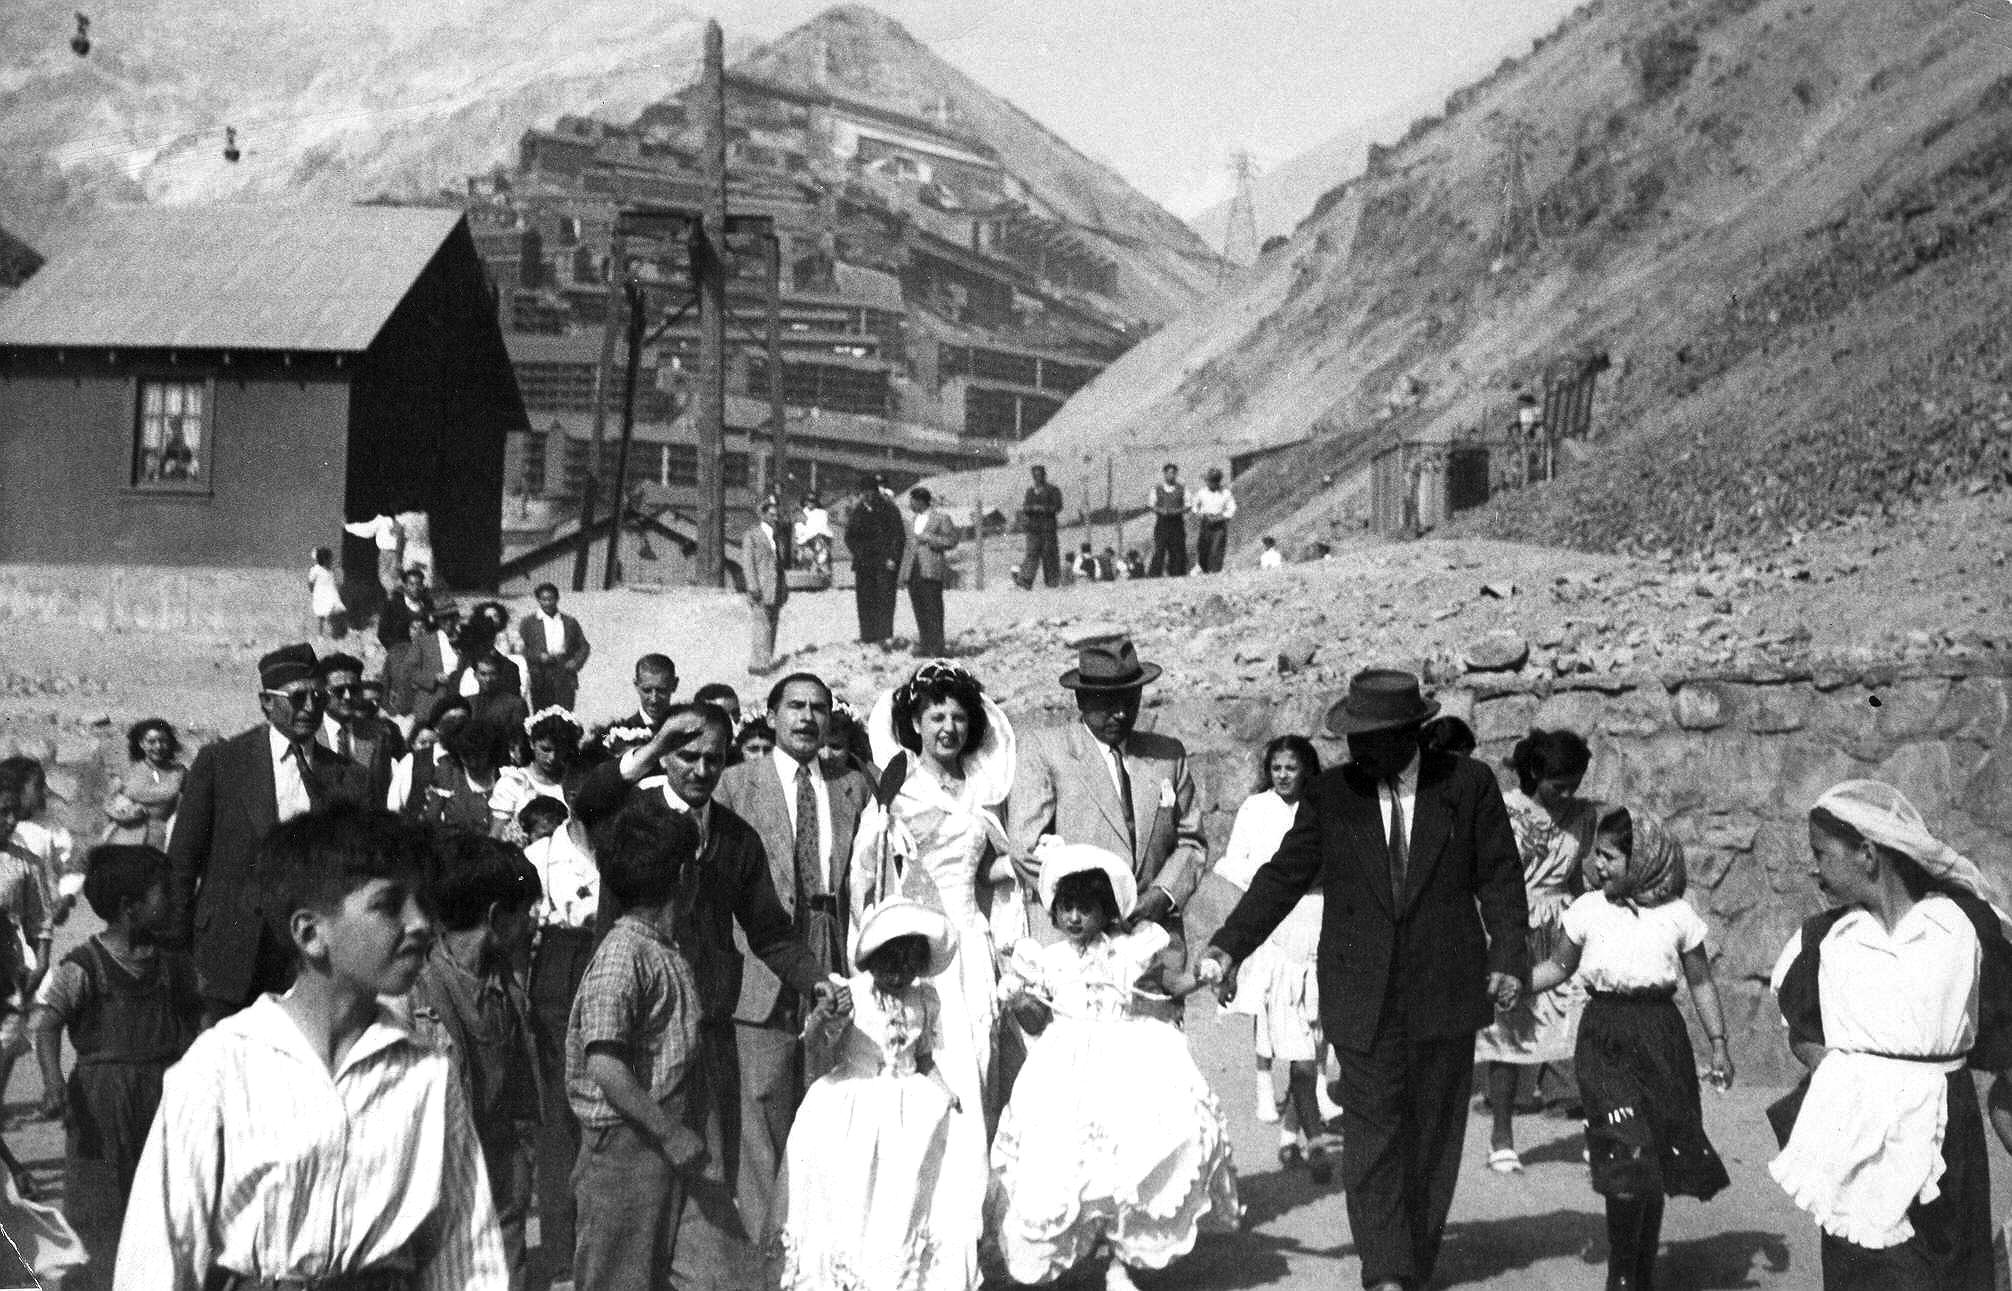 Enterreno - Fotos históricas de chile - fotos antiguas de Chile - Matrimonio en Sewell, ca 1920